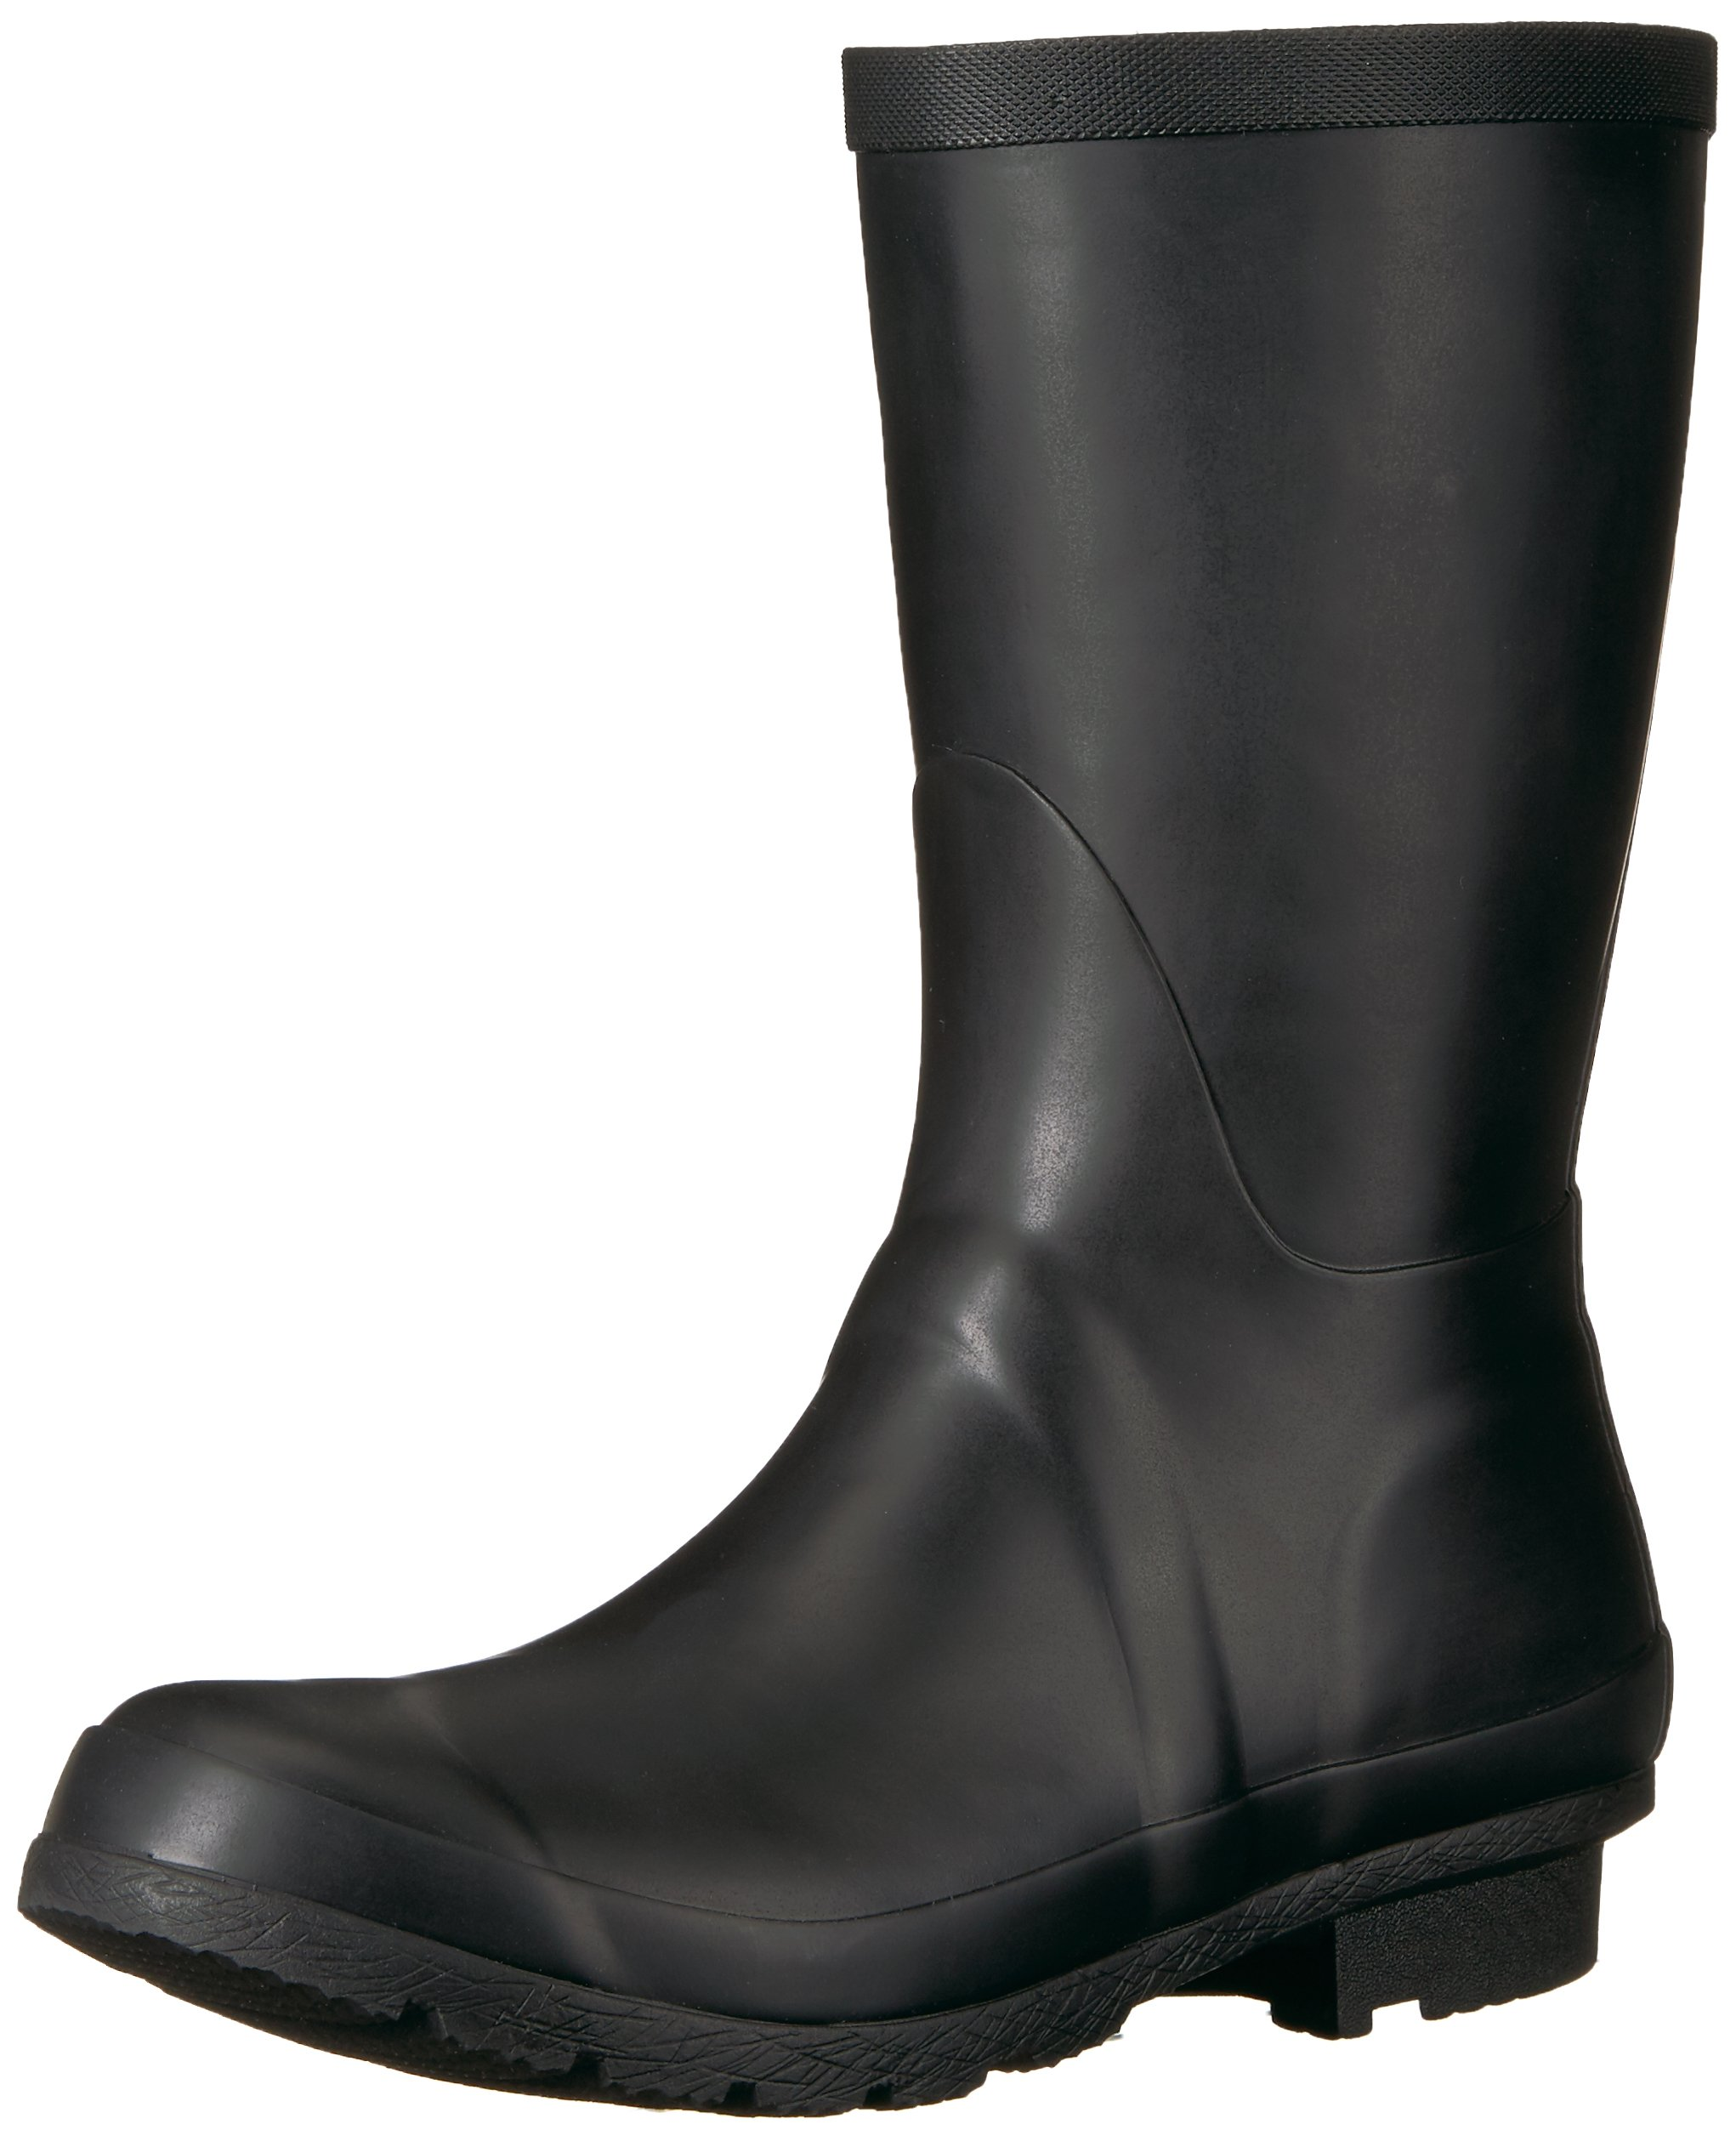 206 Collective Women's Linden Mid Rain Boot, Black, 8 B US